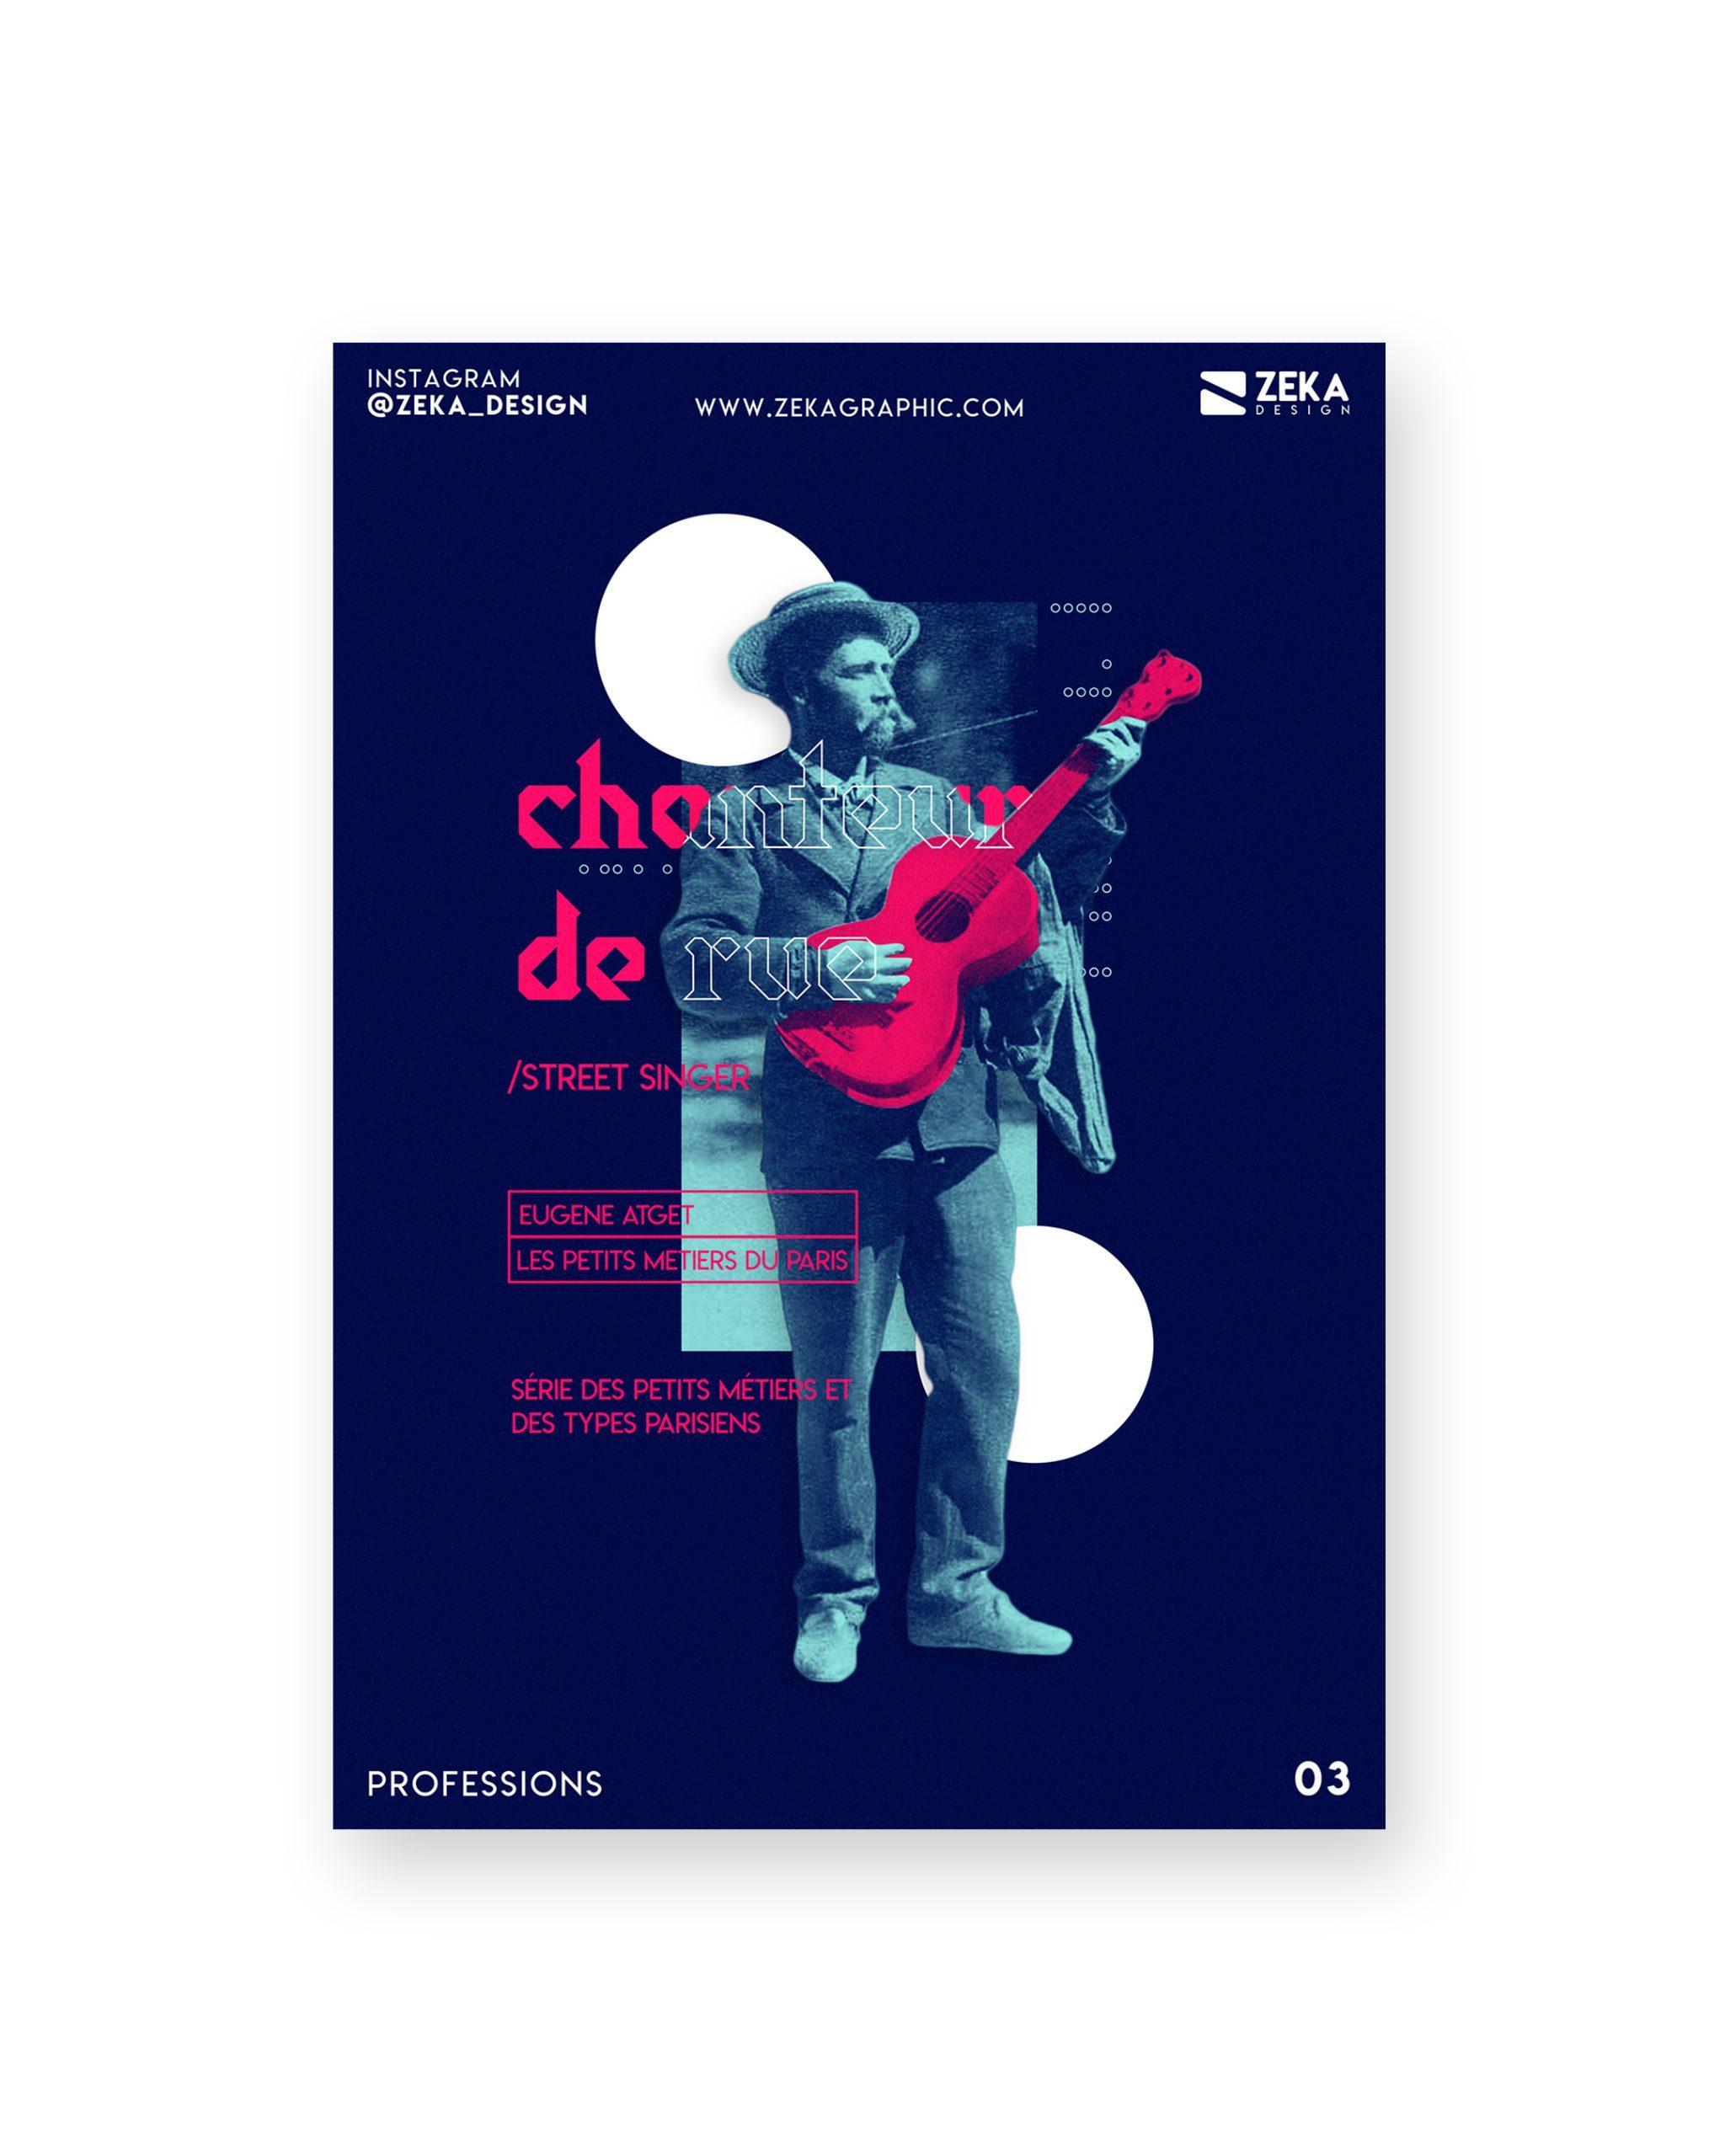 2020 Professions White Poster Design 03 C